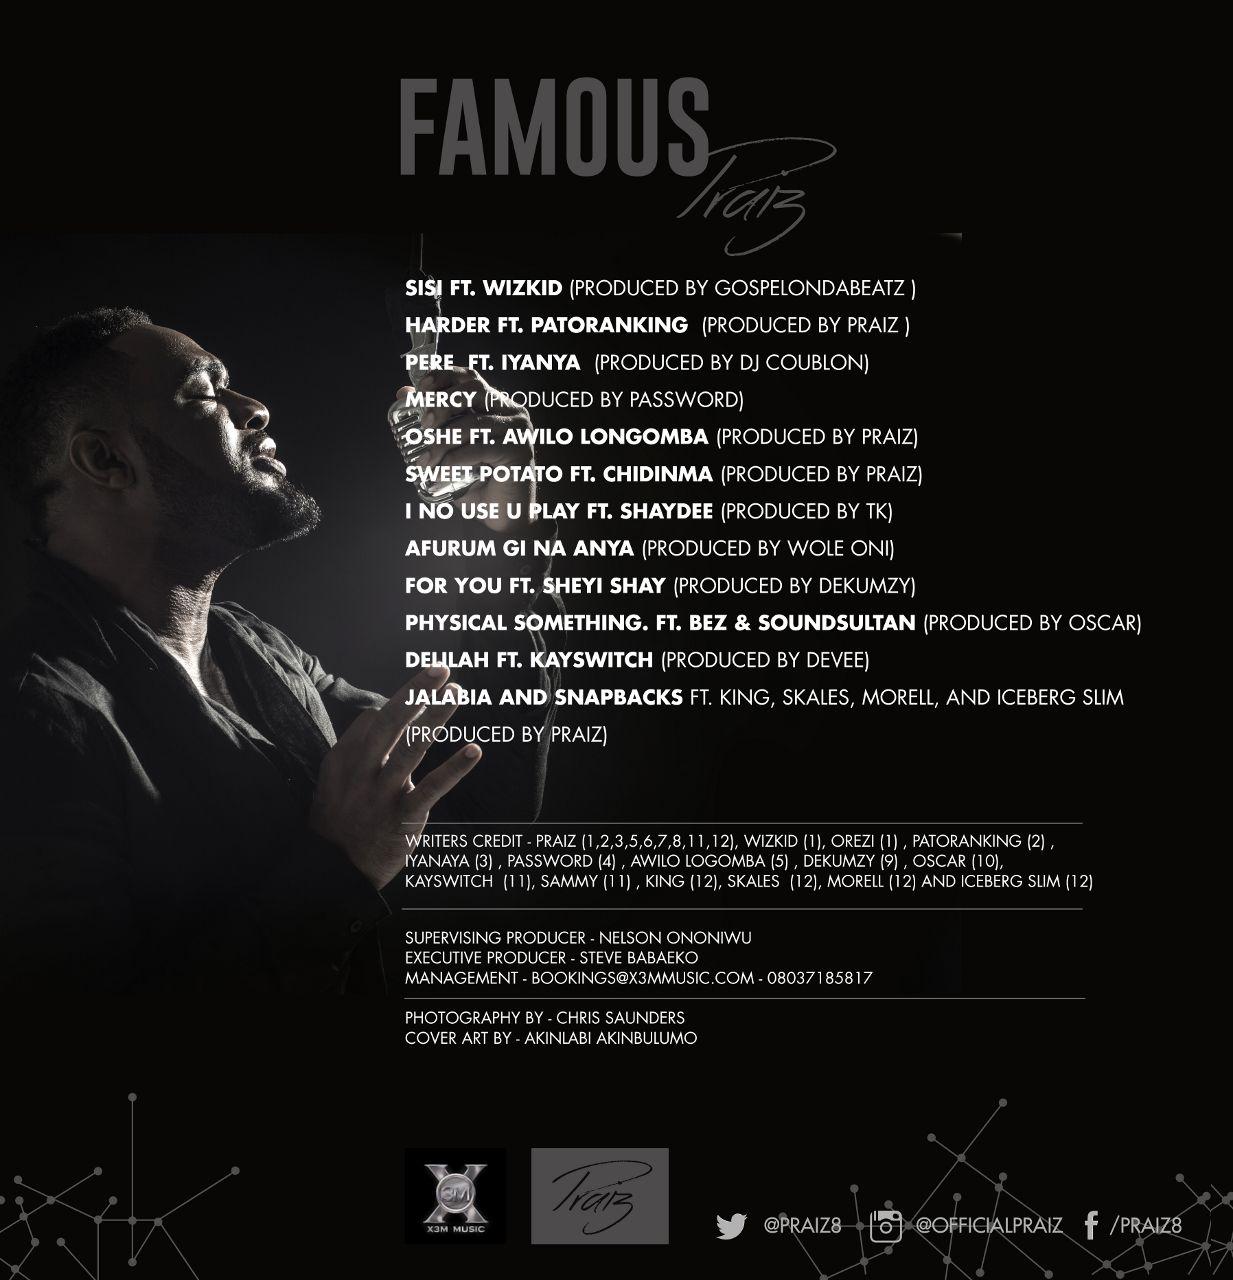 Praiz - Famous (Album Art)-Back